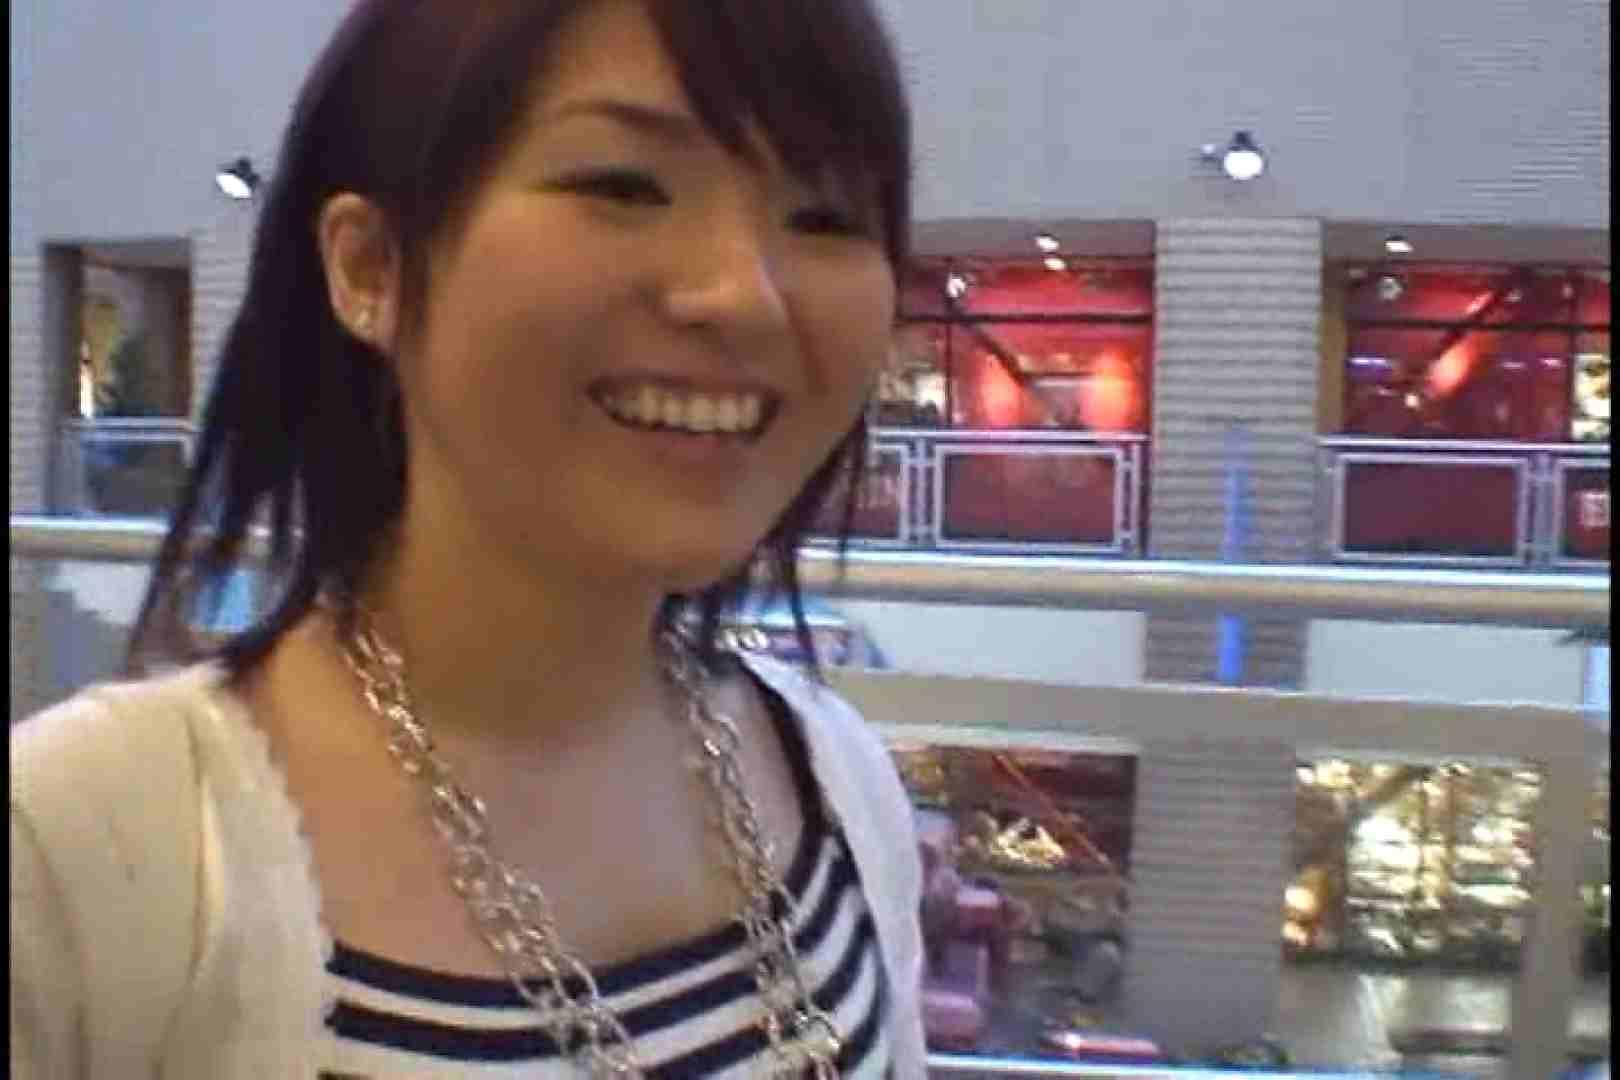 JDハンター全国ツアー vol.002 前編 女子大生丸裸  104pic 46